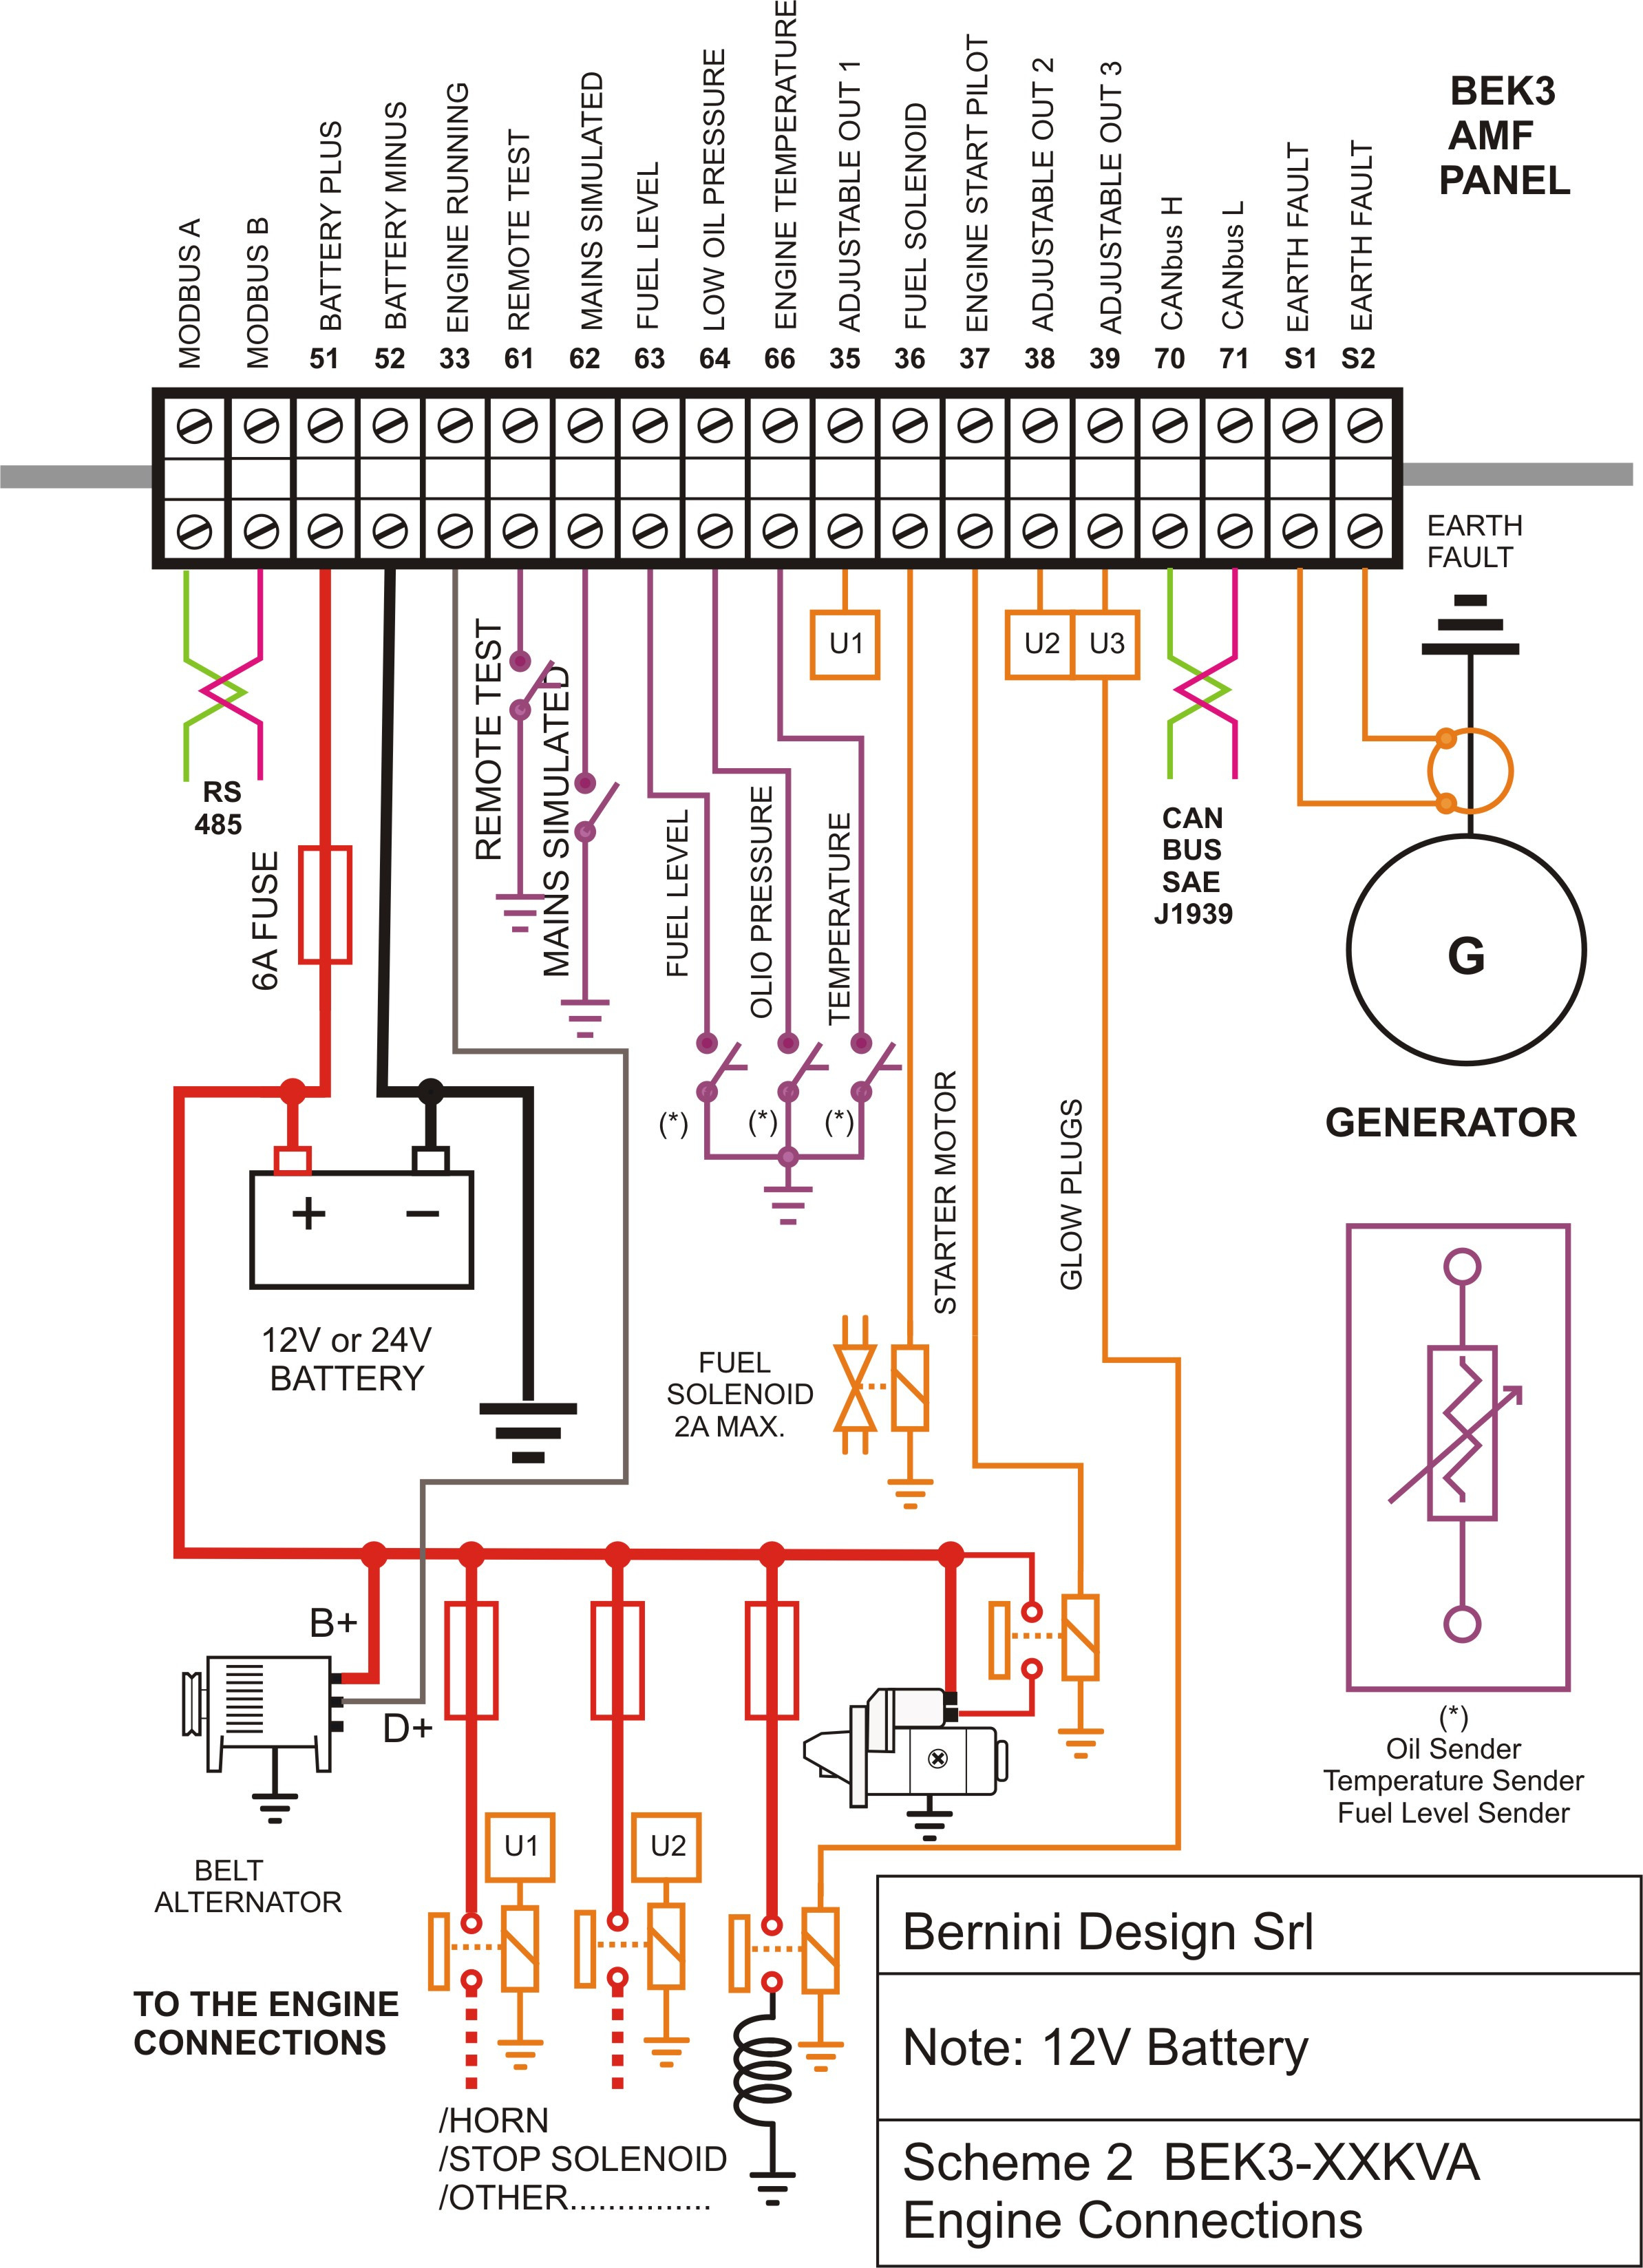 Wilson Alternator Wiring Diagram - Webtor - Wilson Alternator Wiring Diagram